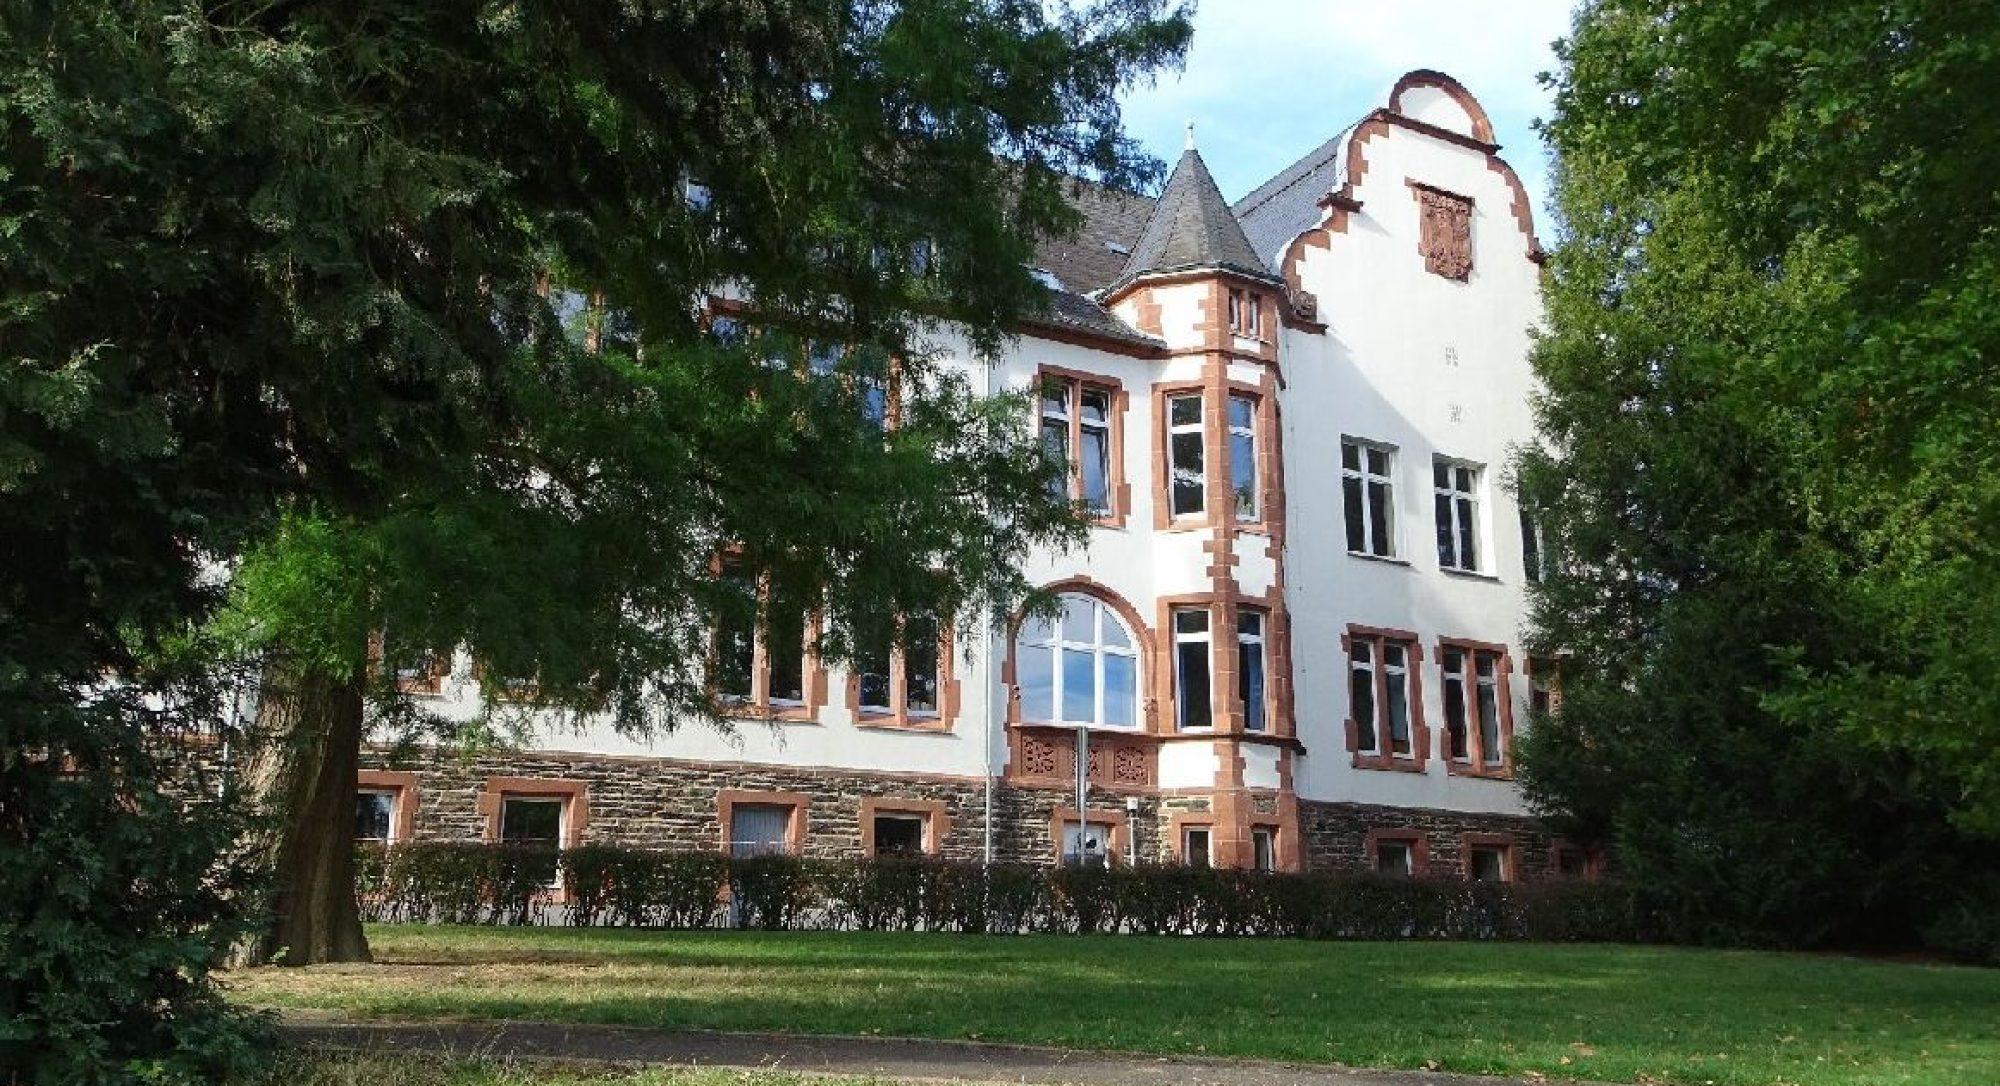 Gymnasium Traben-Trarbach